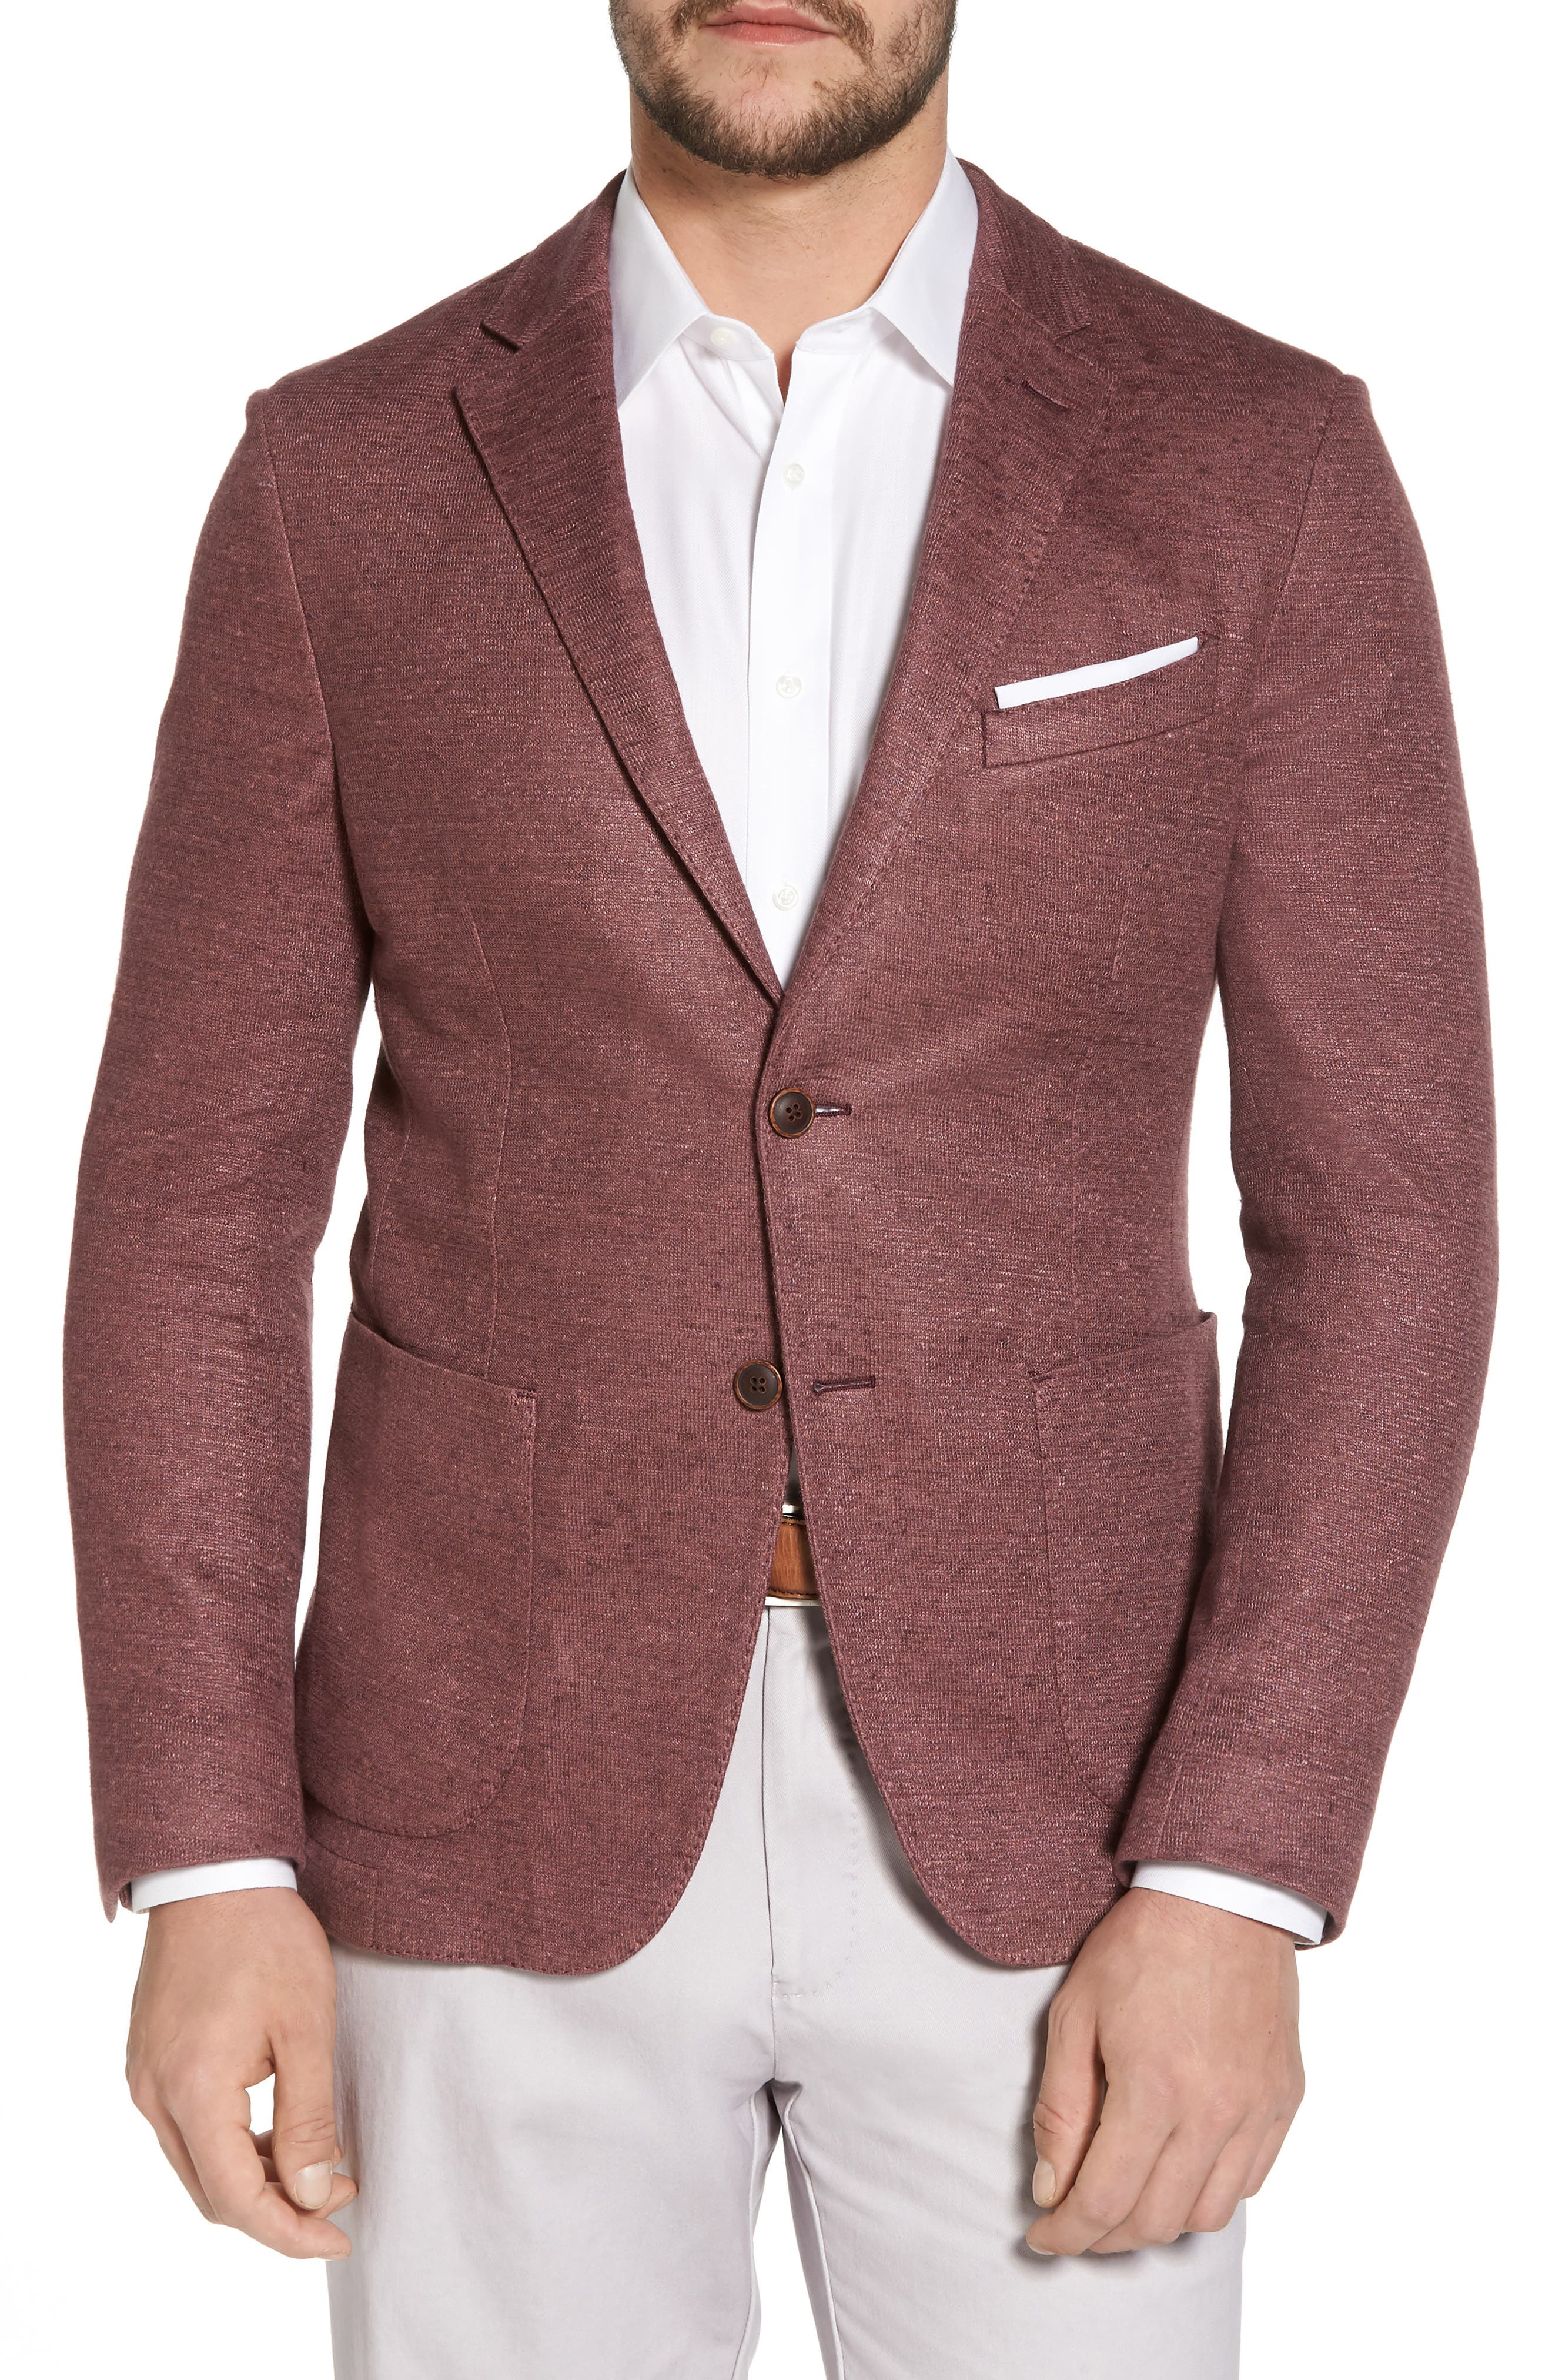 Trim Fit Heathered Jersey Blazer,                         Main,                         color, Wine